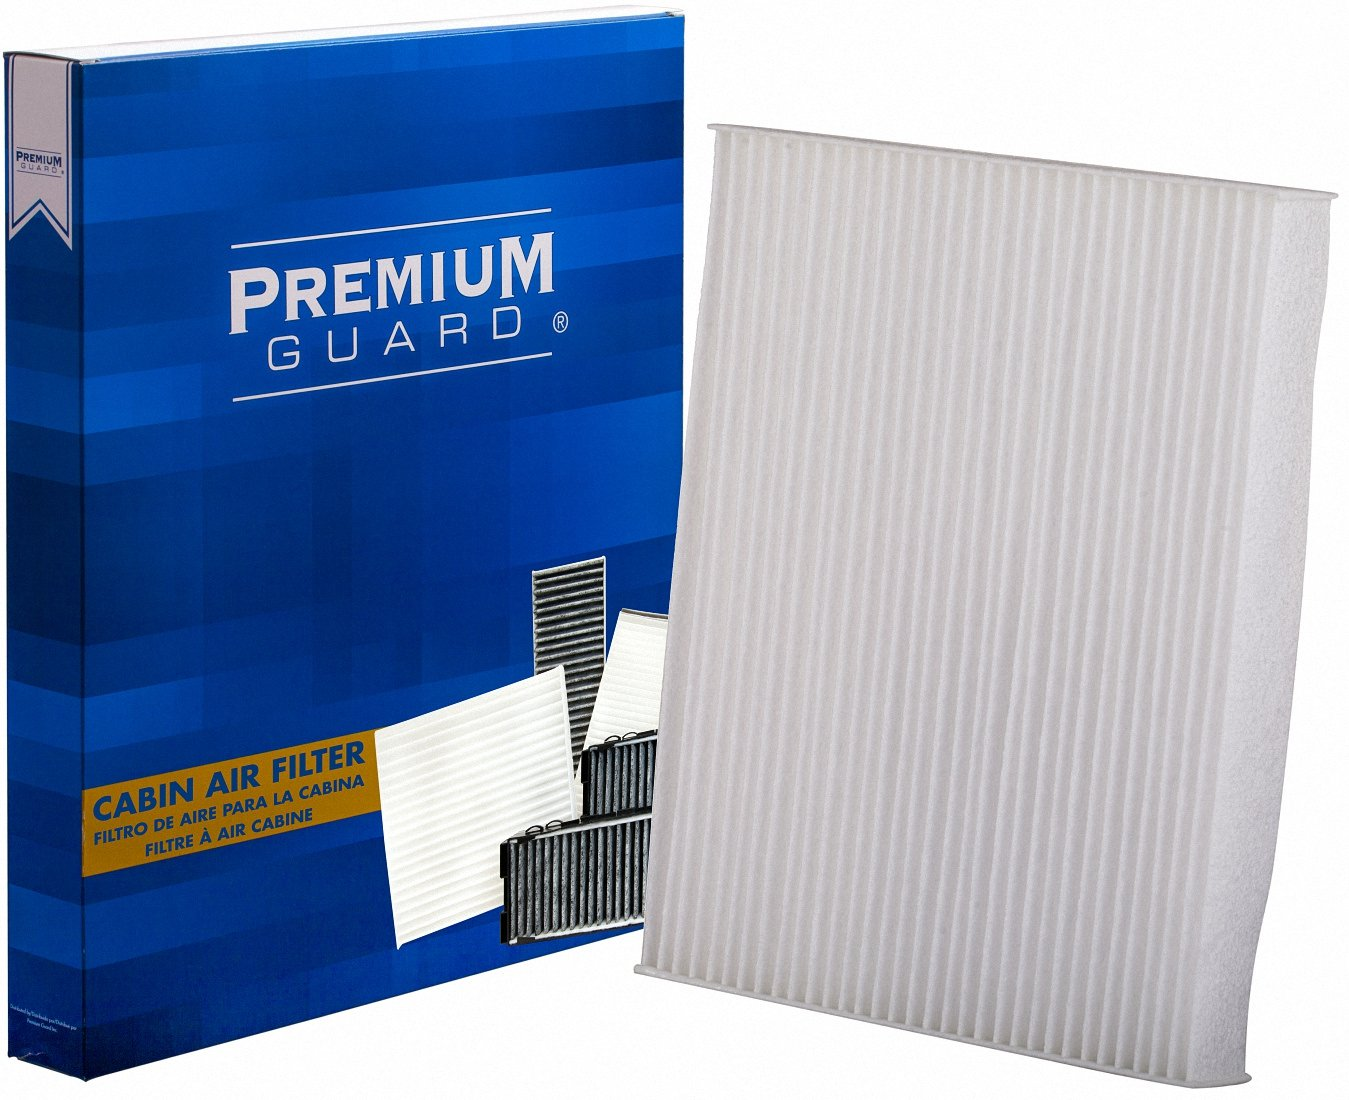 Premium Guard Cabin Air Filter PC99156 | Fits 2014-2018 Kia Soul by Premium Guard